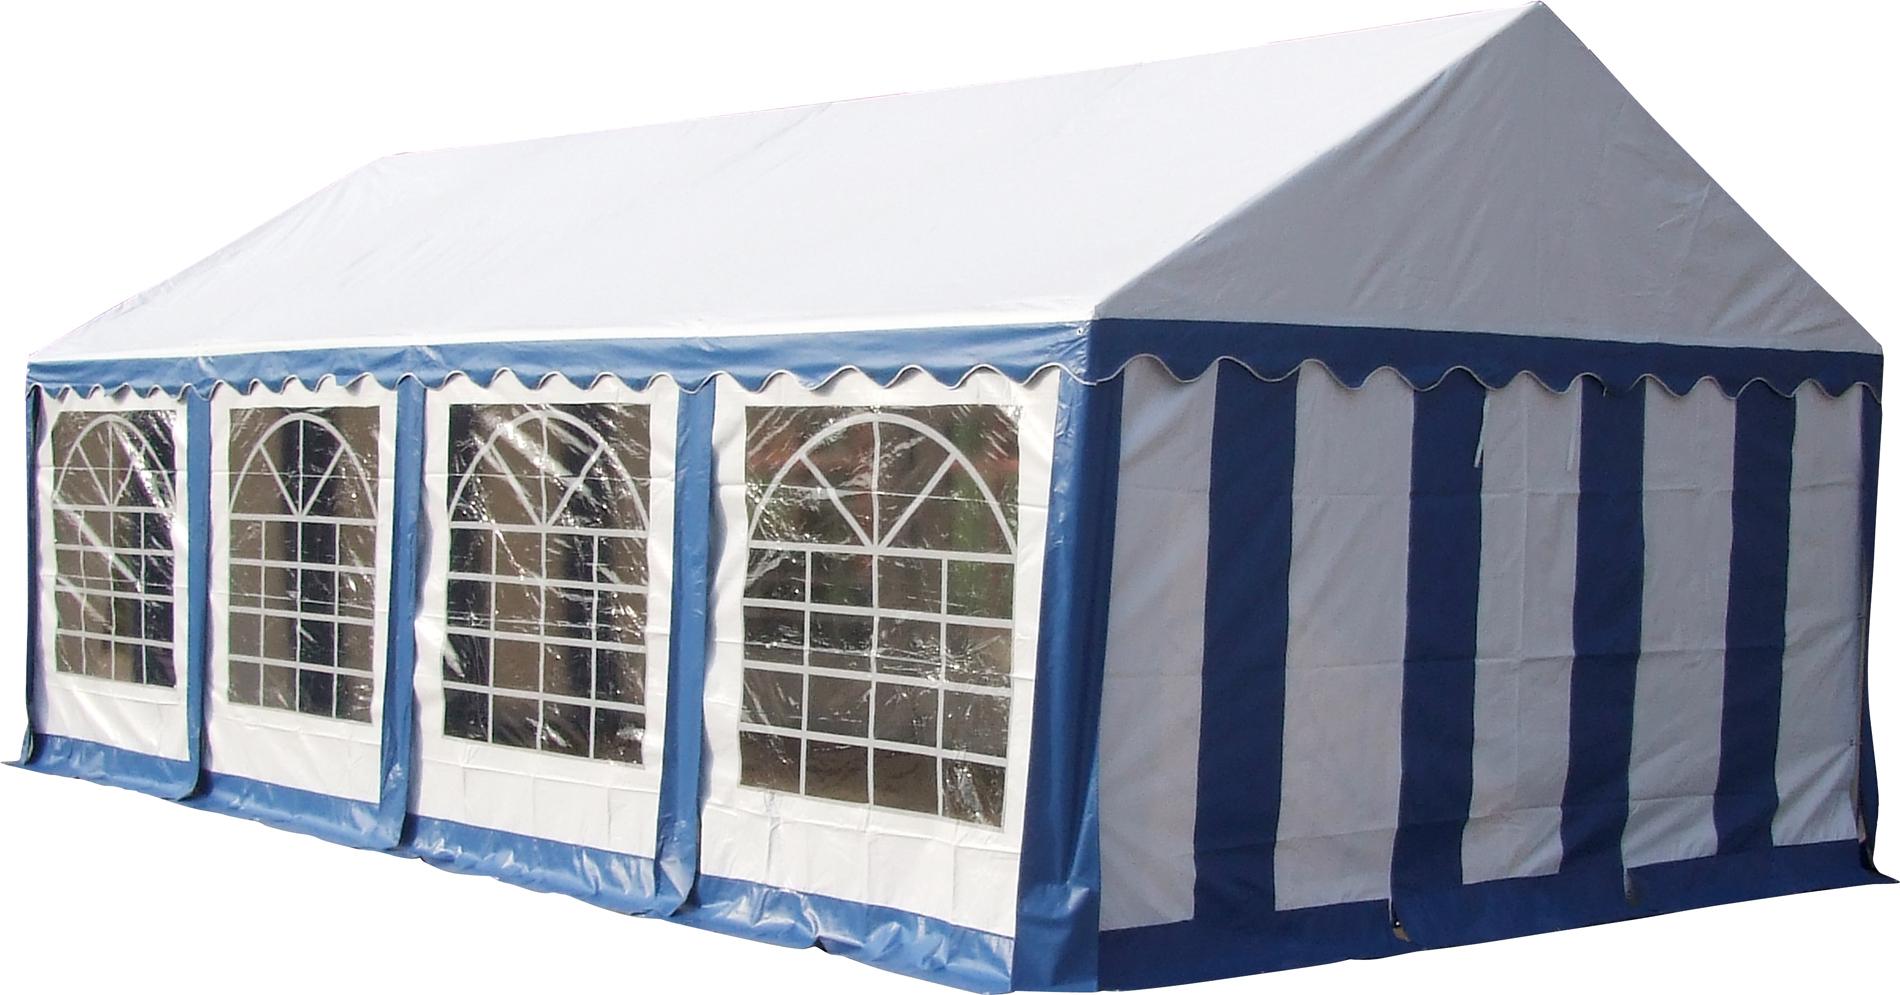 Купить Тент-шатер Sundays, 48201, Китай